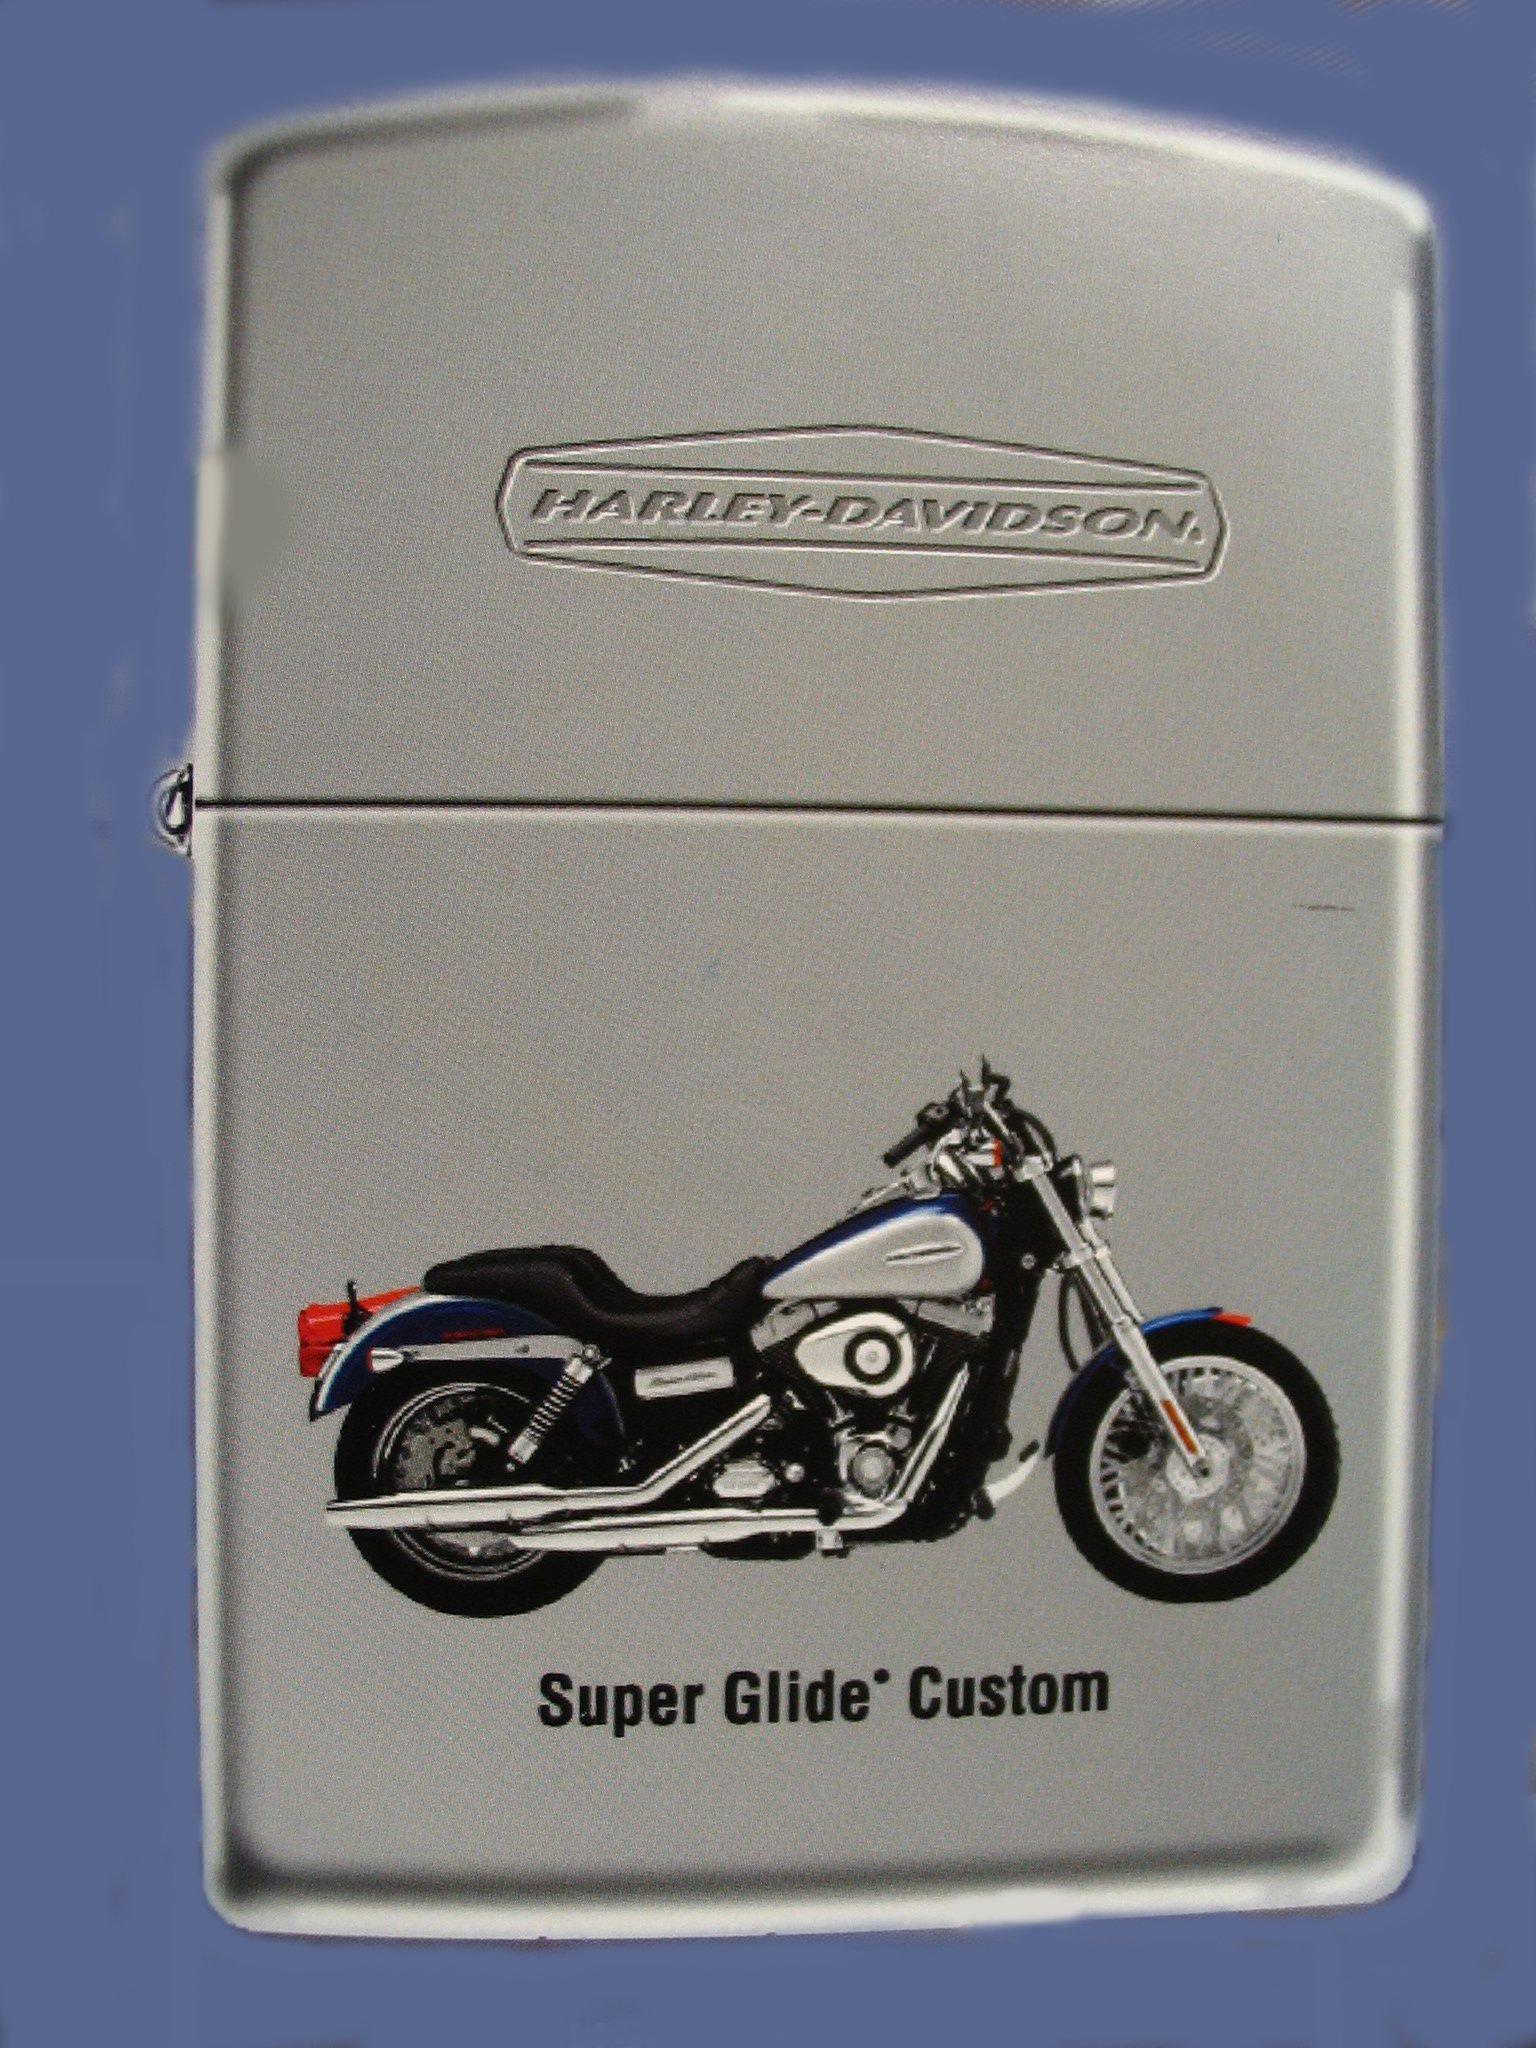 Harley Davidson Motor Cycles Super Glide Custom Zippo Lighter